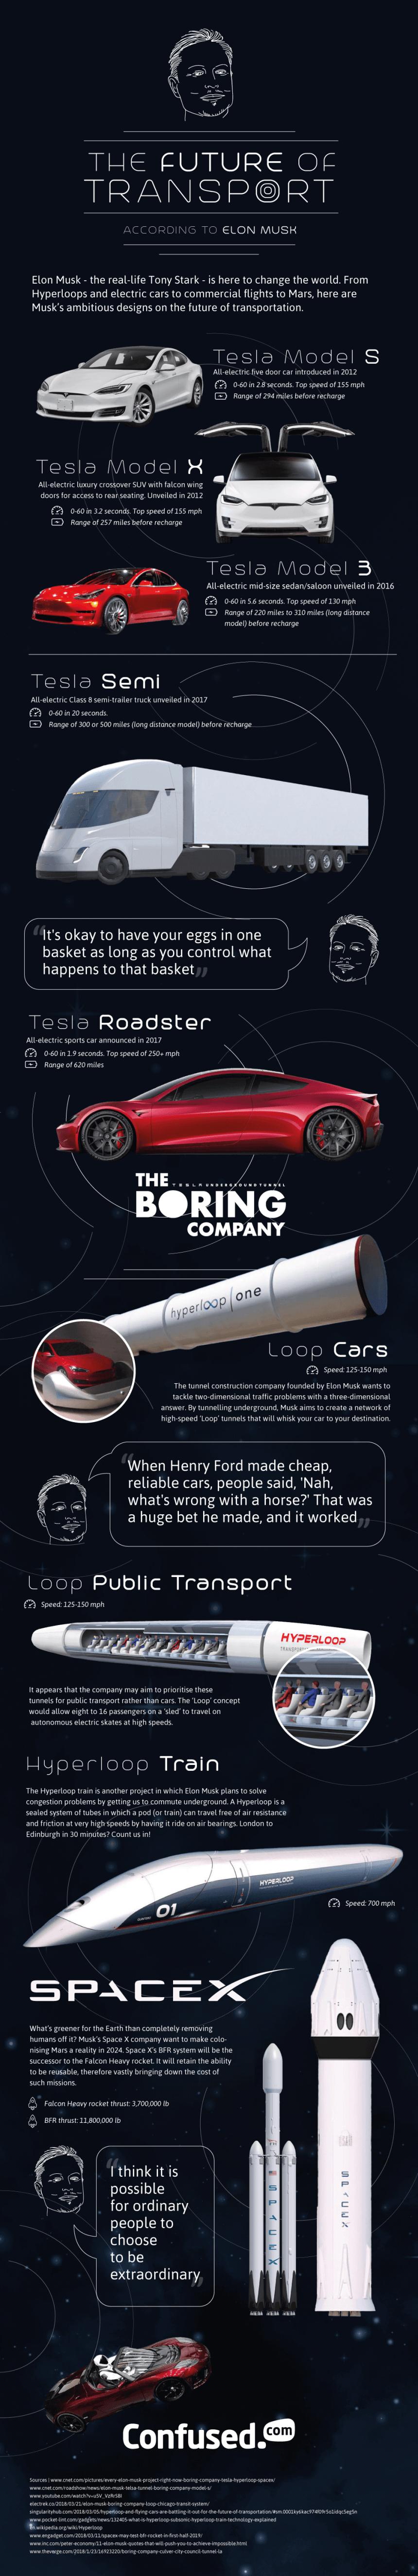 El futuro del transporte según Elon Musk #infografia #infographic #tech